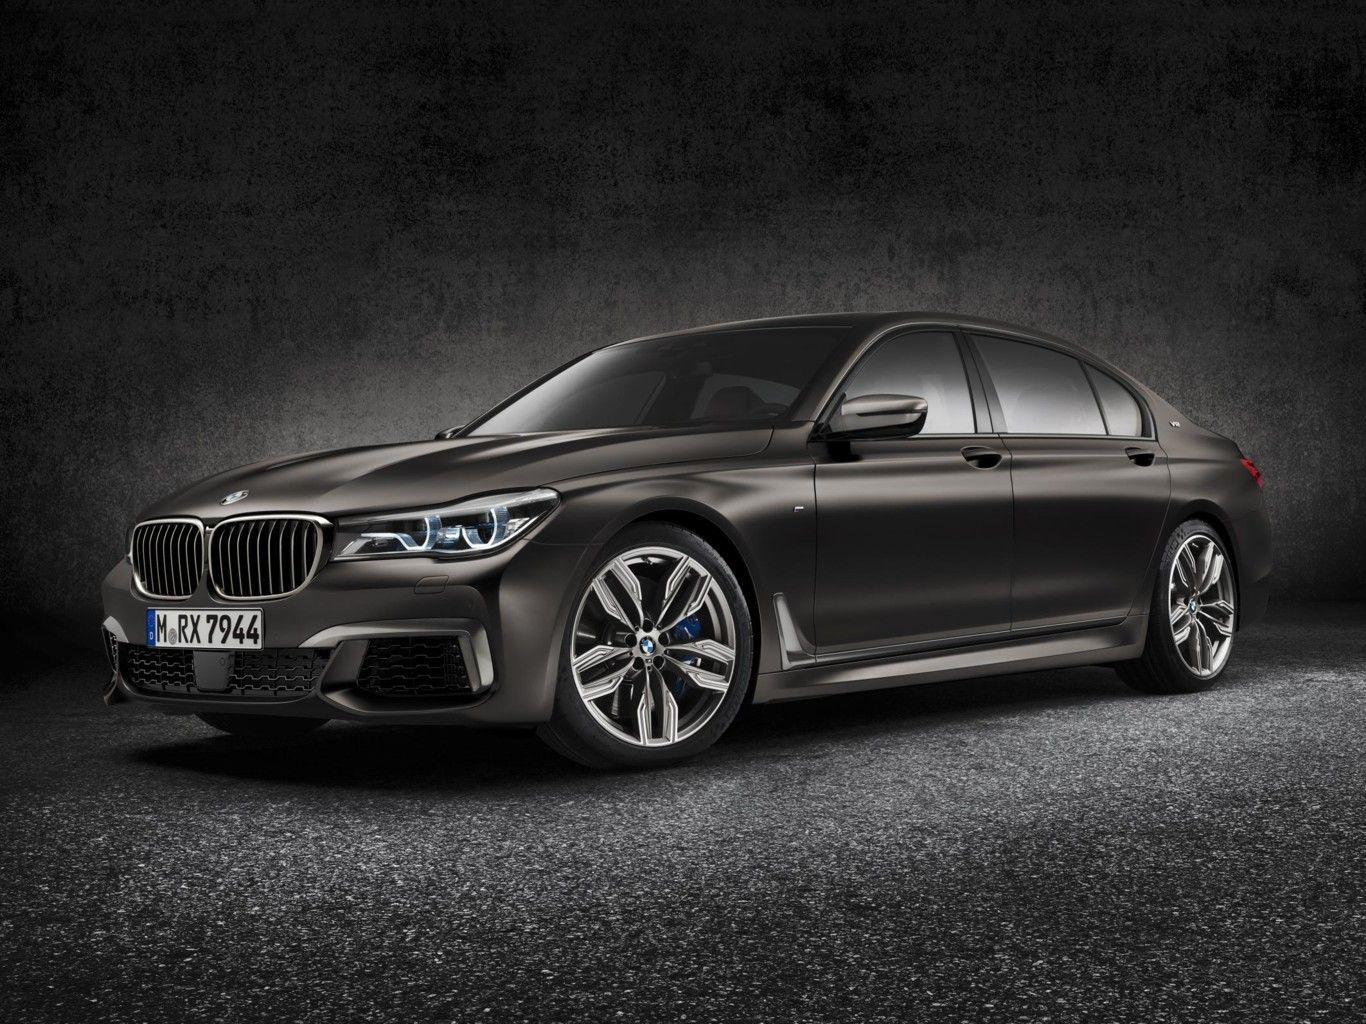 Perspectiva frontolateral del BMW M760Li xDrive de color gris oscuro